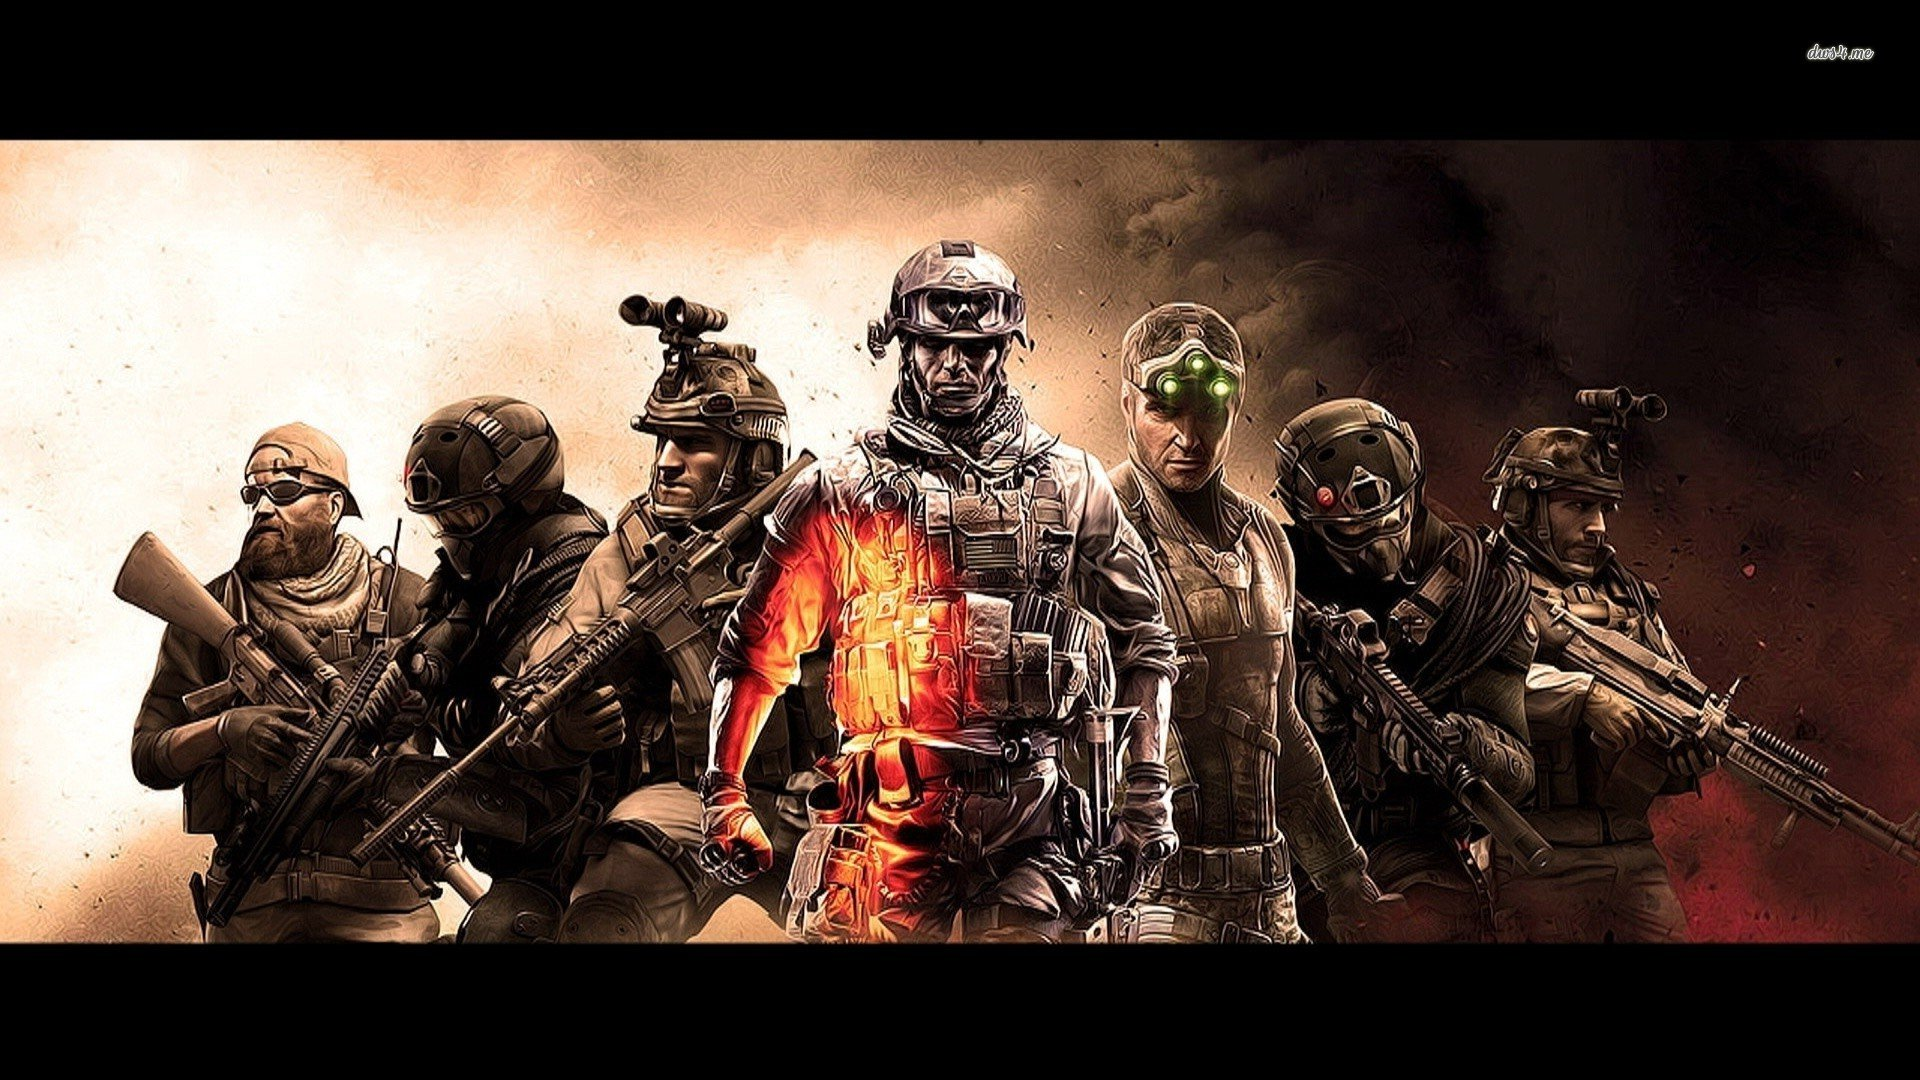 Battle Game Heroes Wallpaper Walldevil Warface Hd